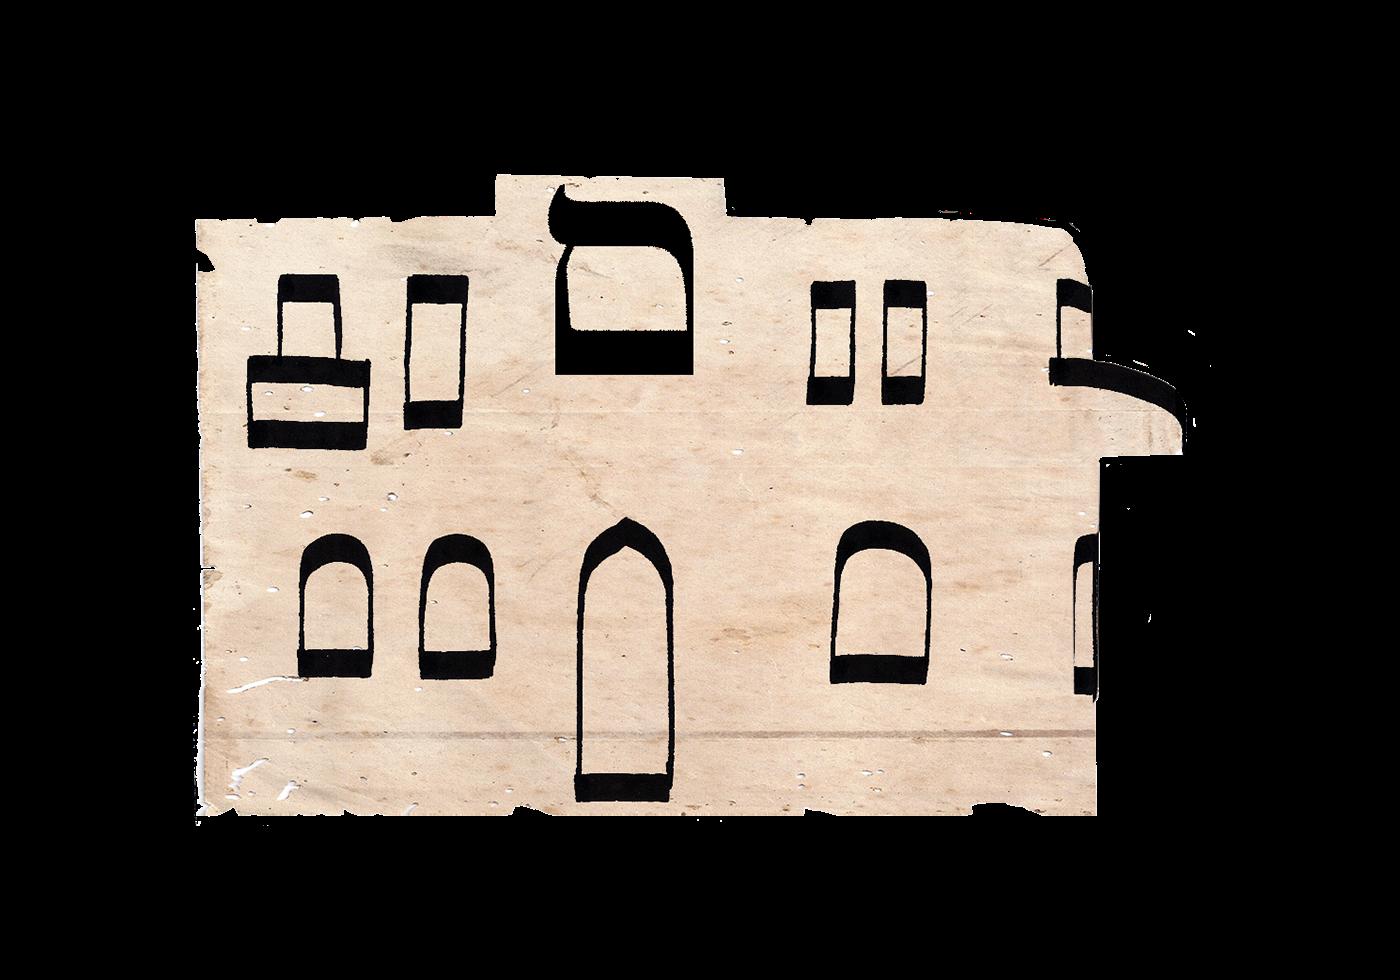 Tel Aviv buildings windows final project city Urban font